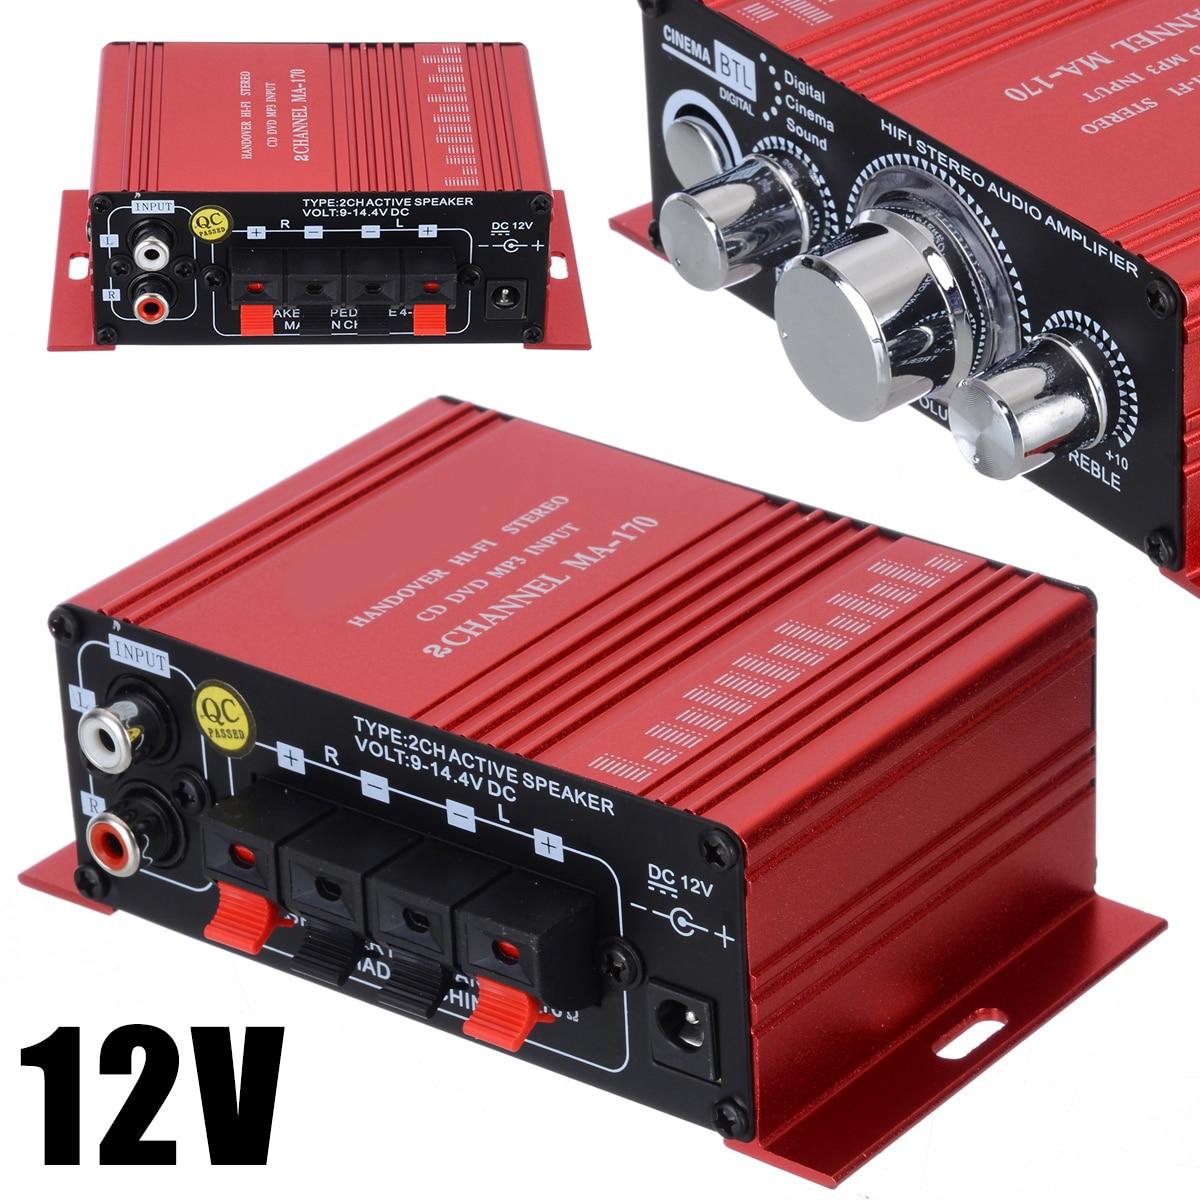 MA-170 Red Stereo HiFi Amplifier Aluminium 2 Channel Amplifiers For Computer Desktop Speaker 20Hz To 20KHz